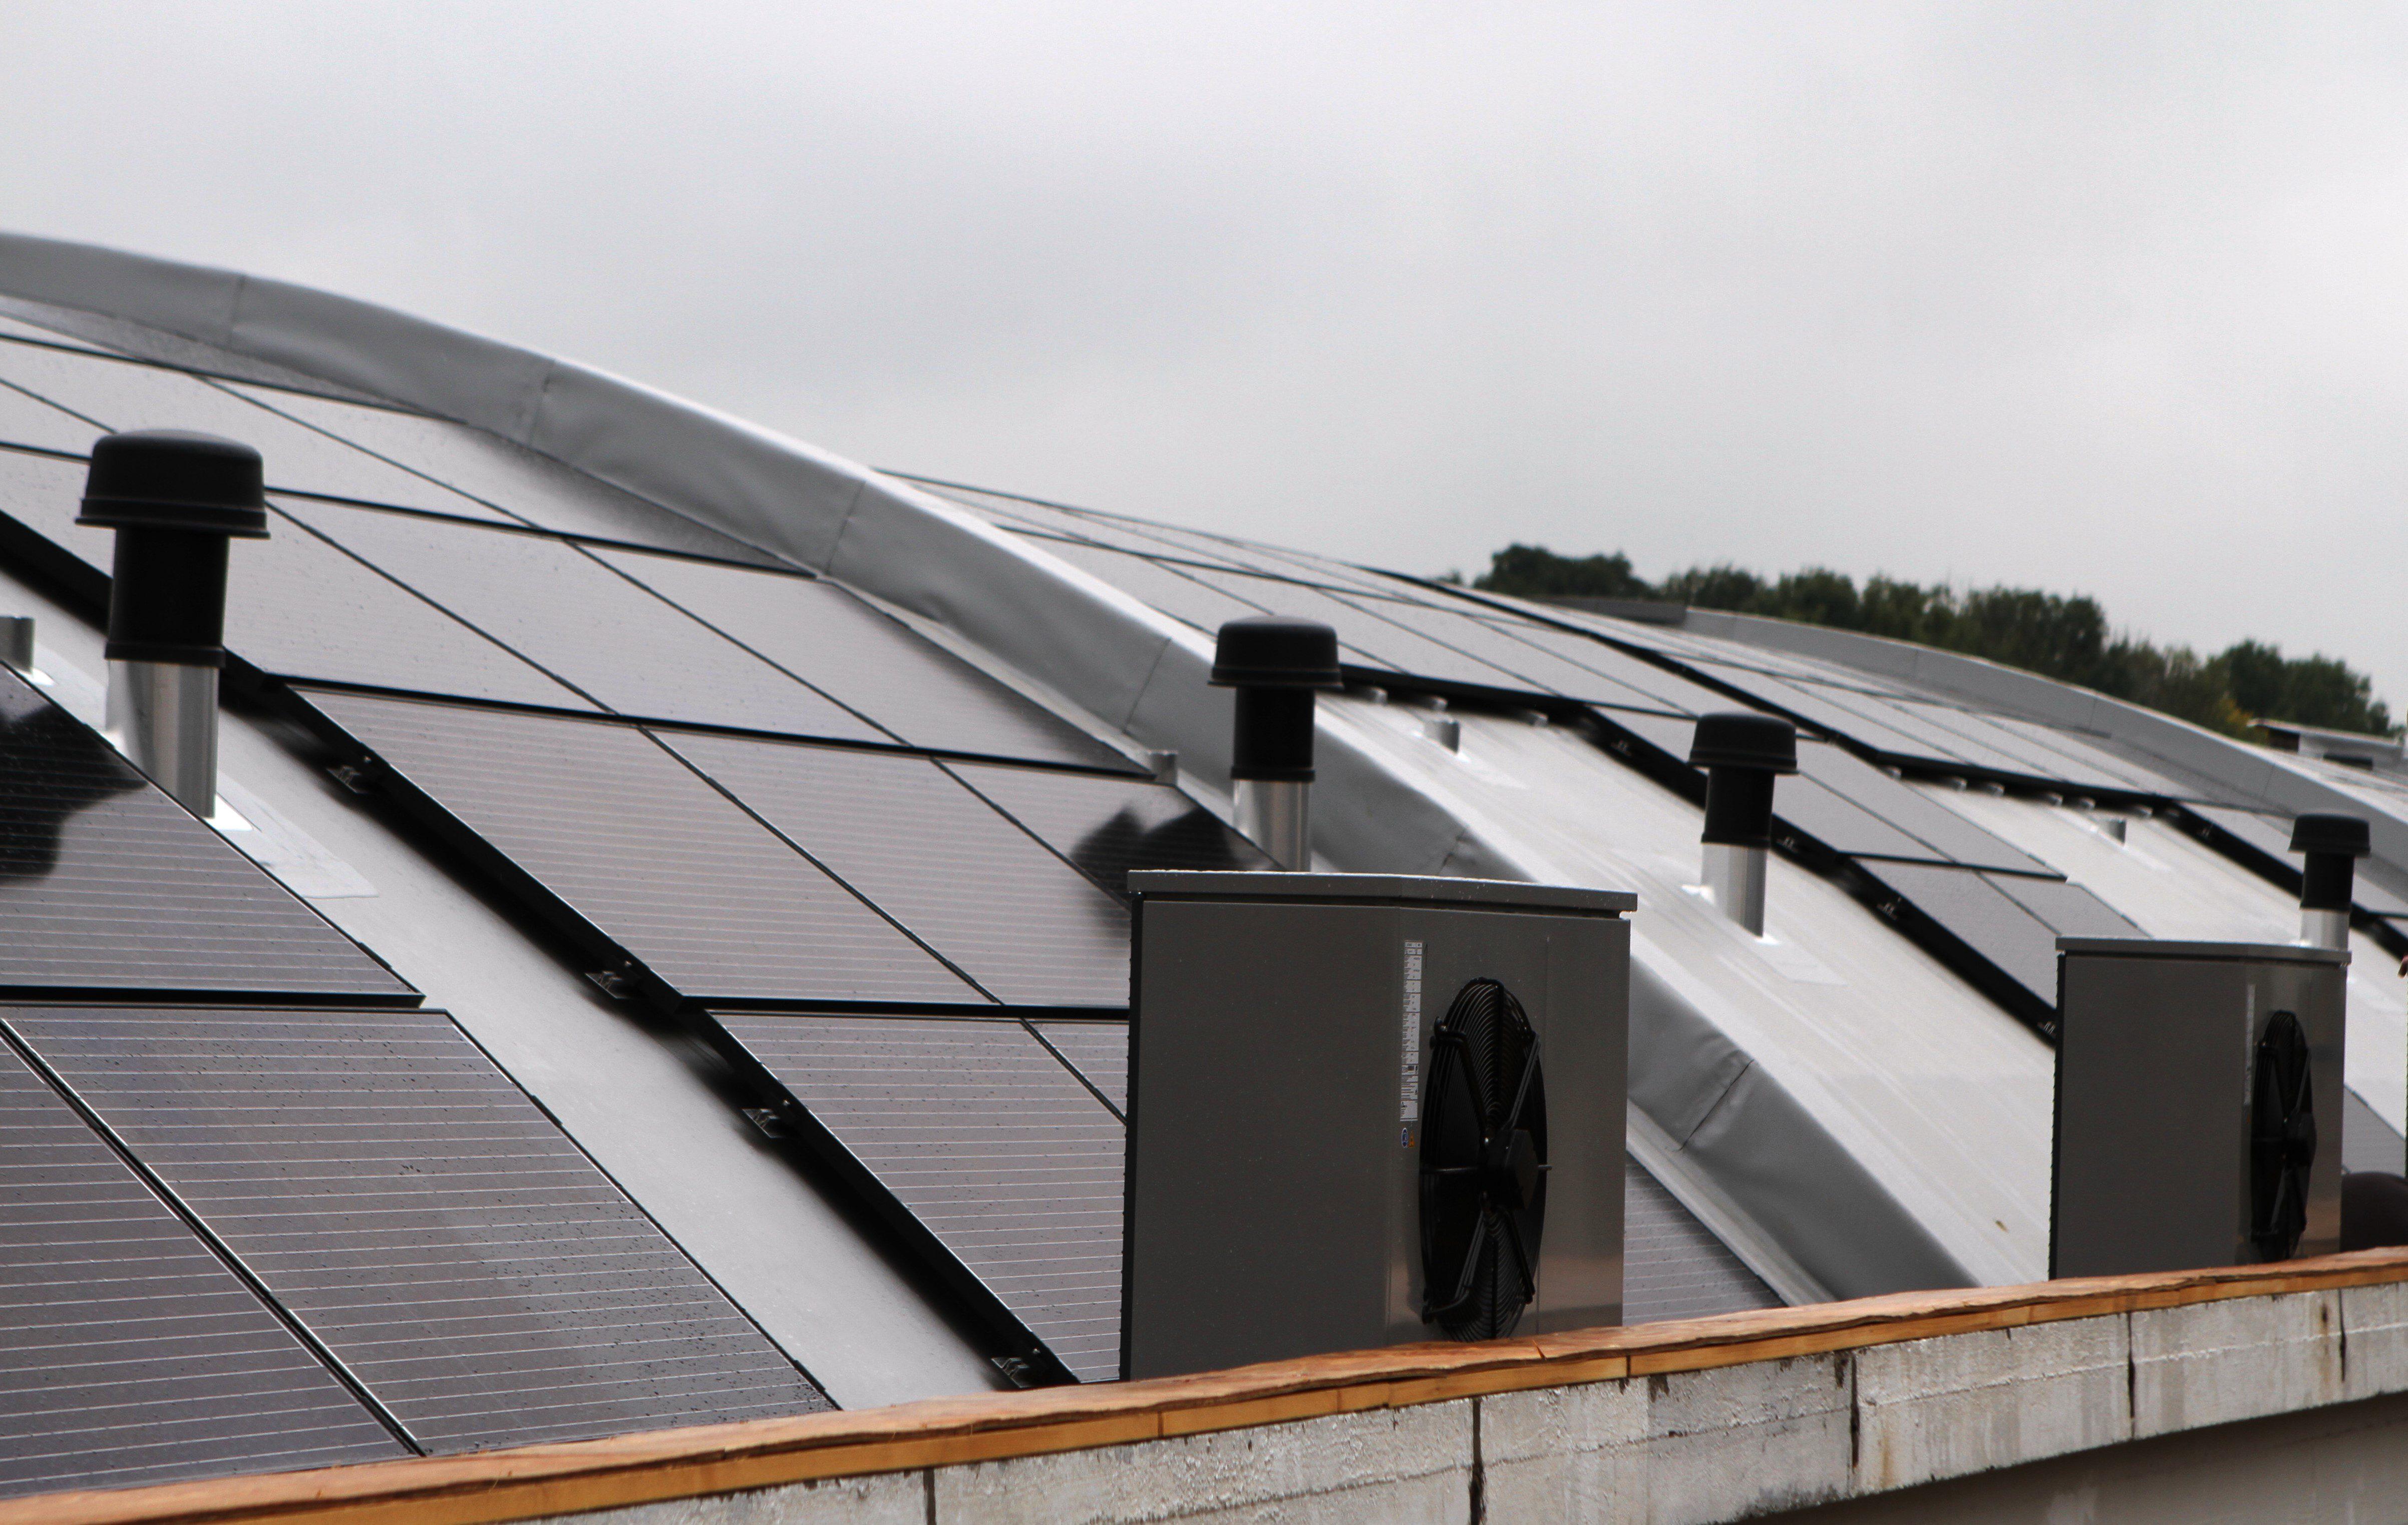 MPG milieudata, zonnepanelen, epc